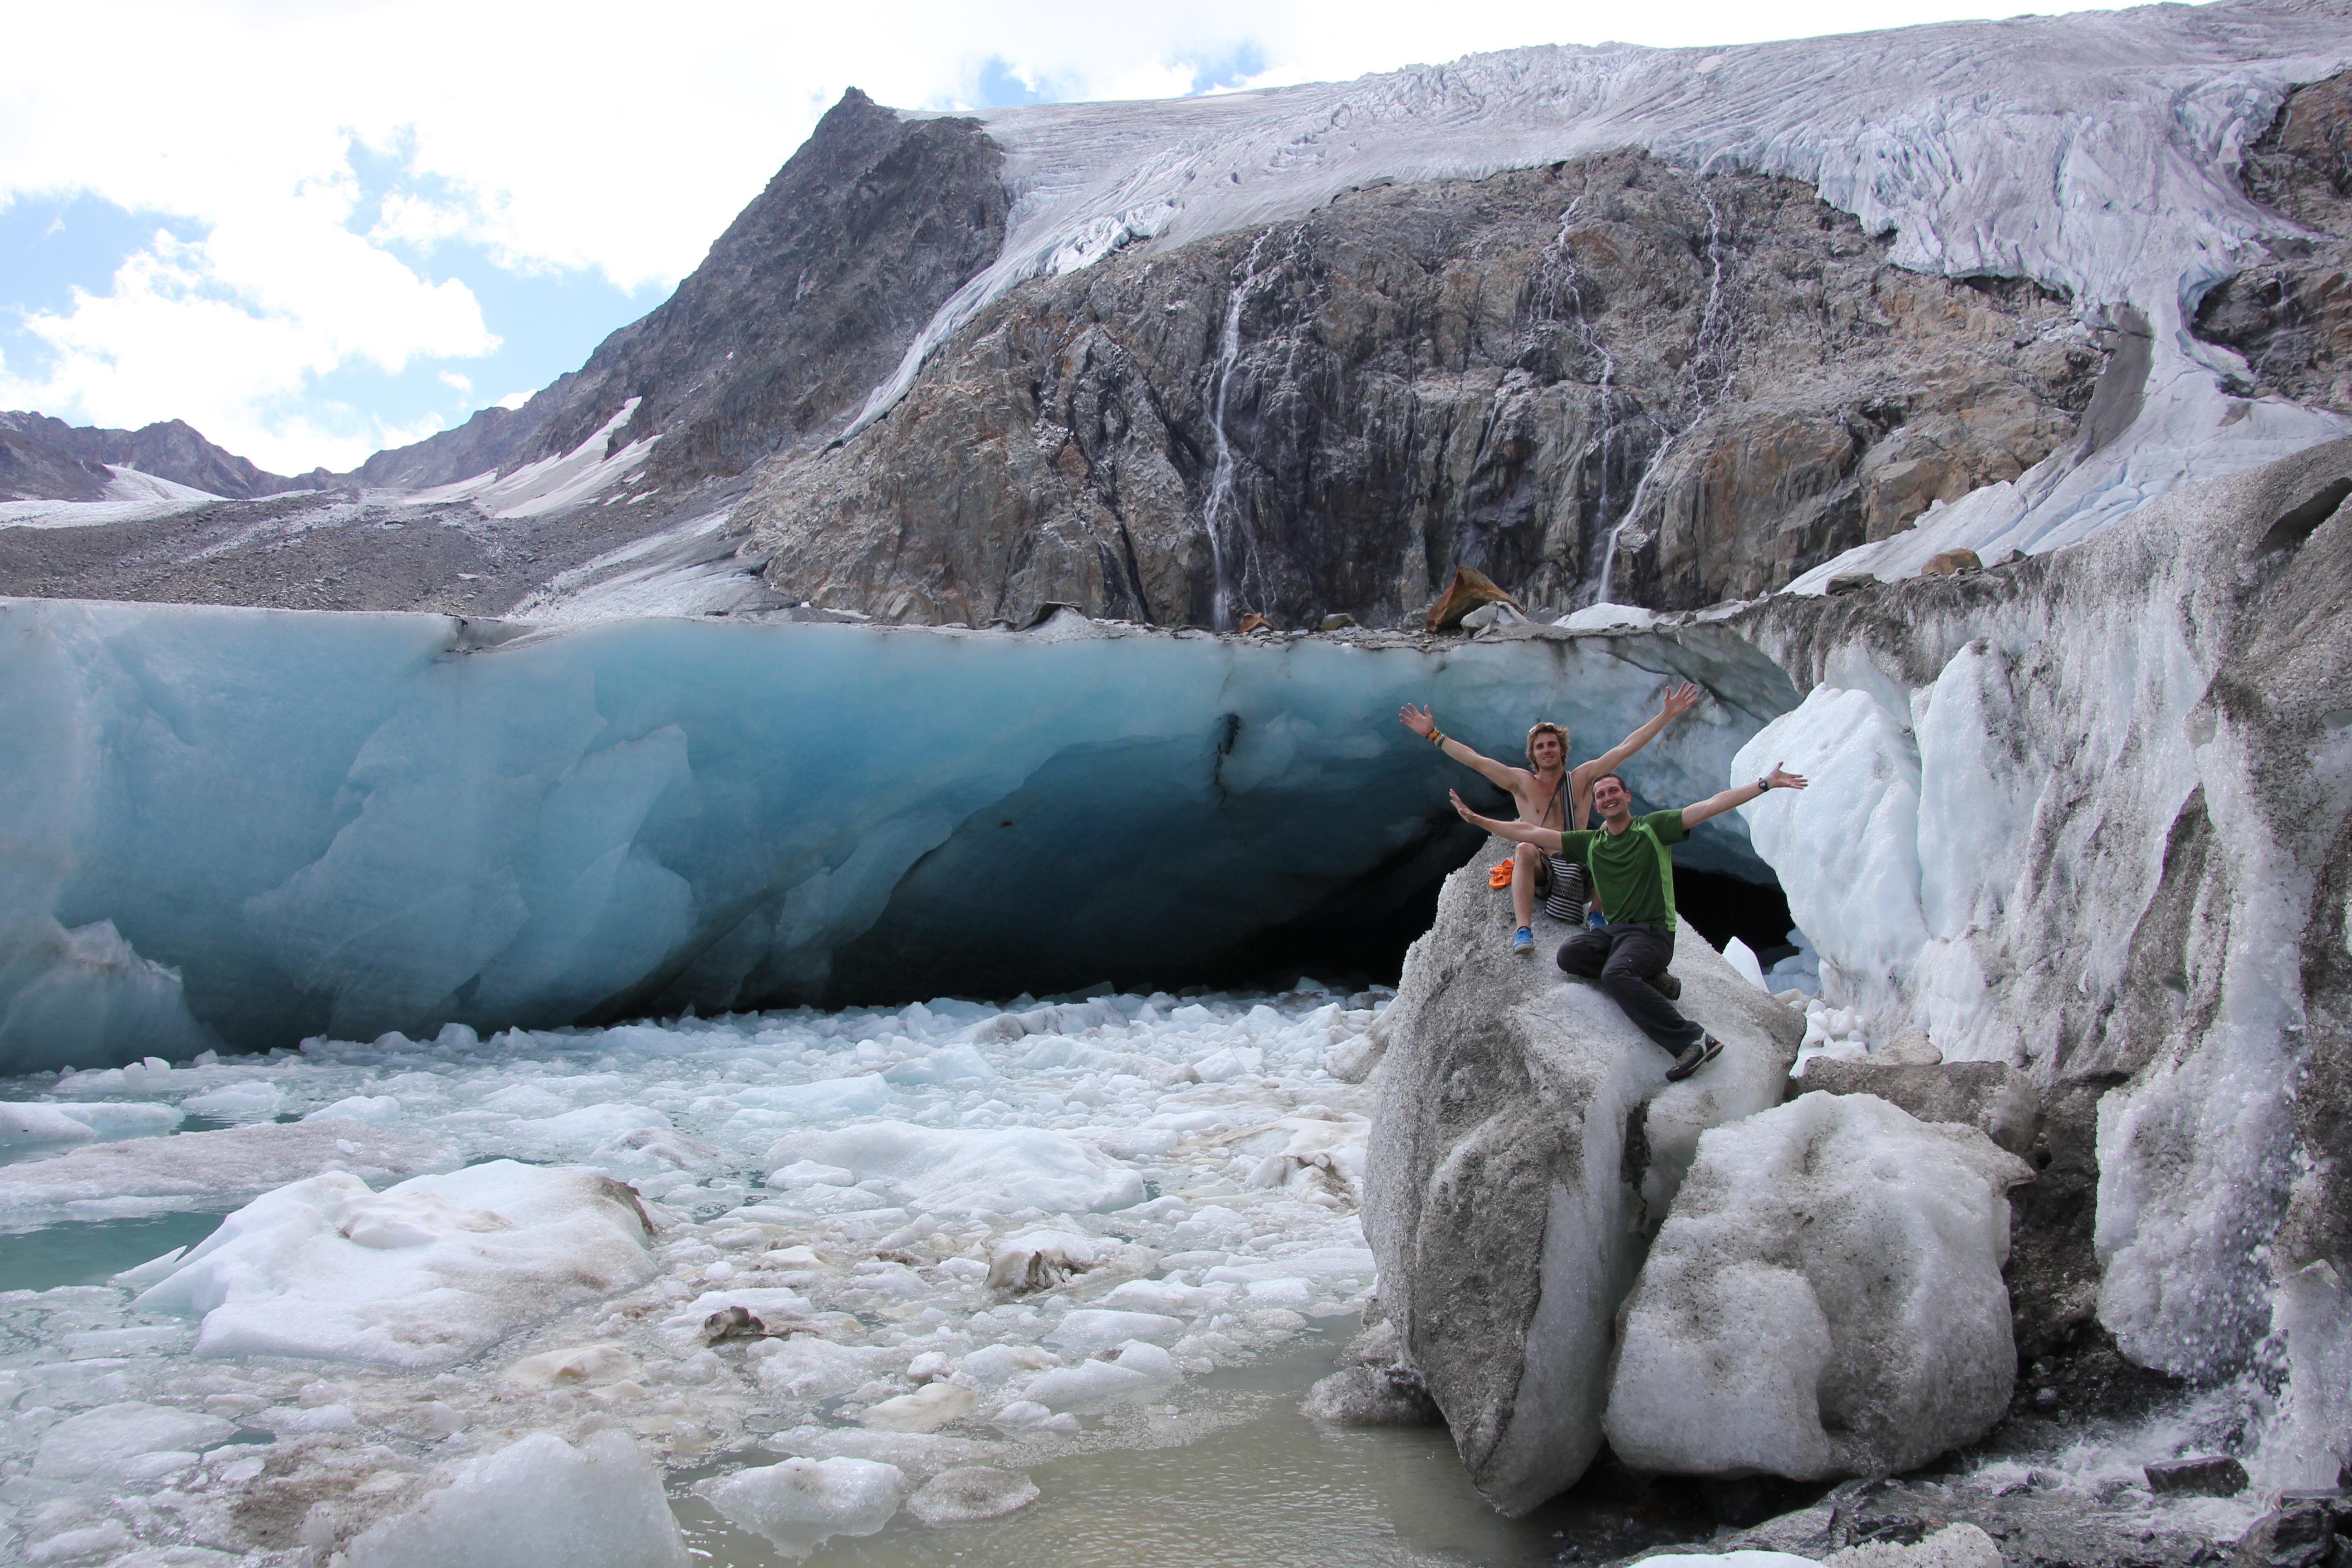 Sulzenau | Doug's Mountain Getaway